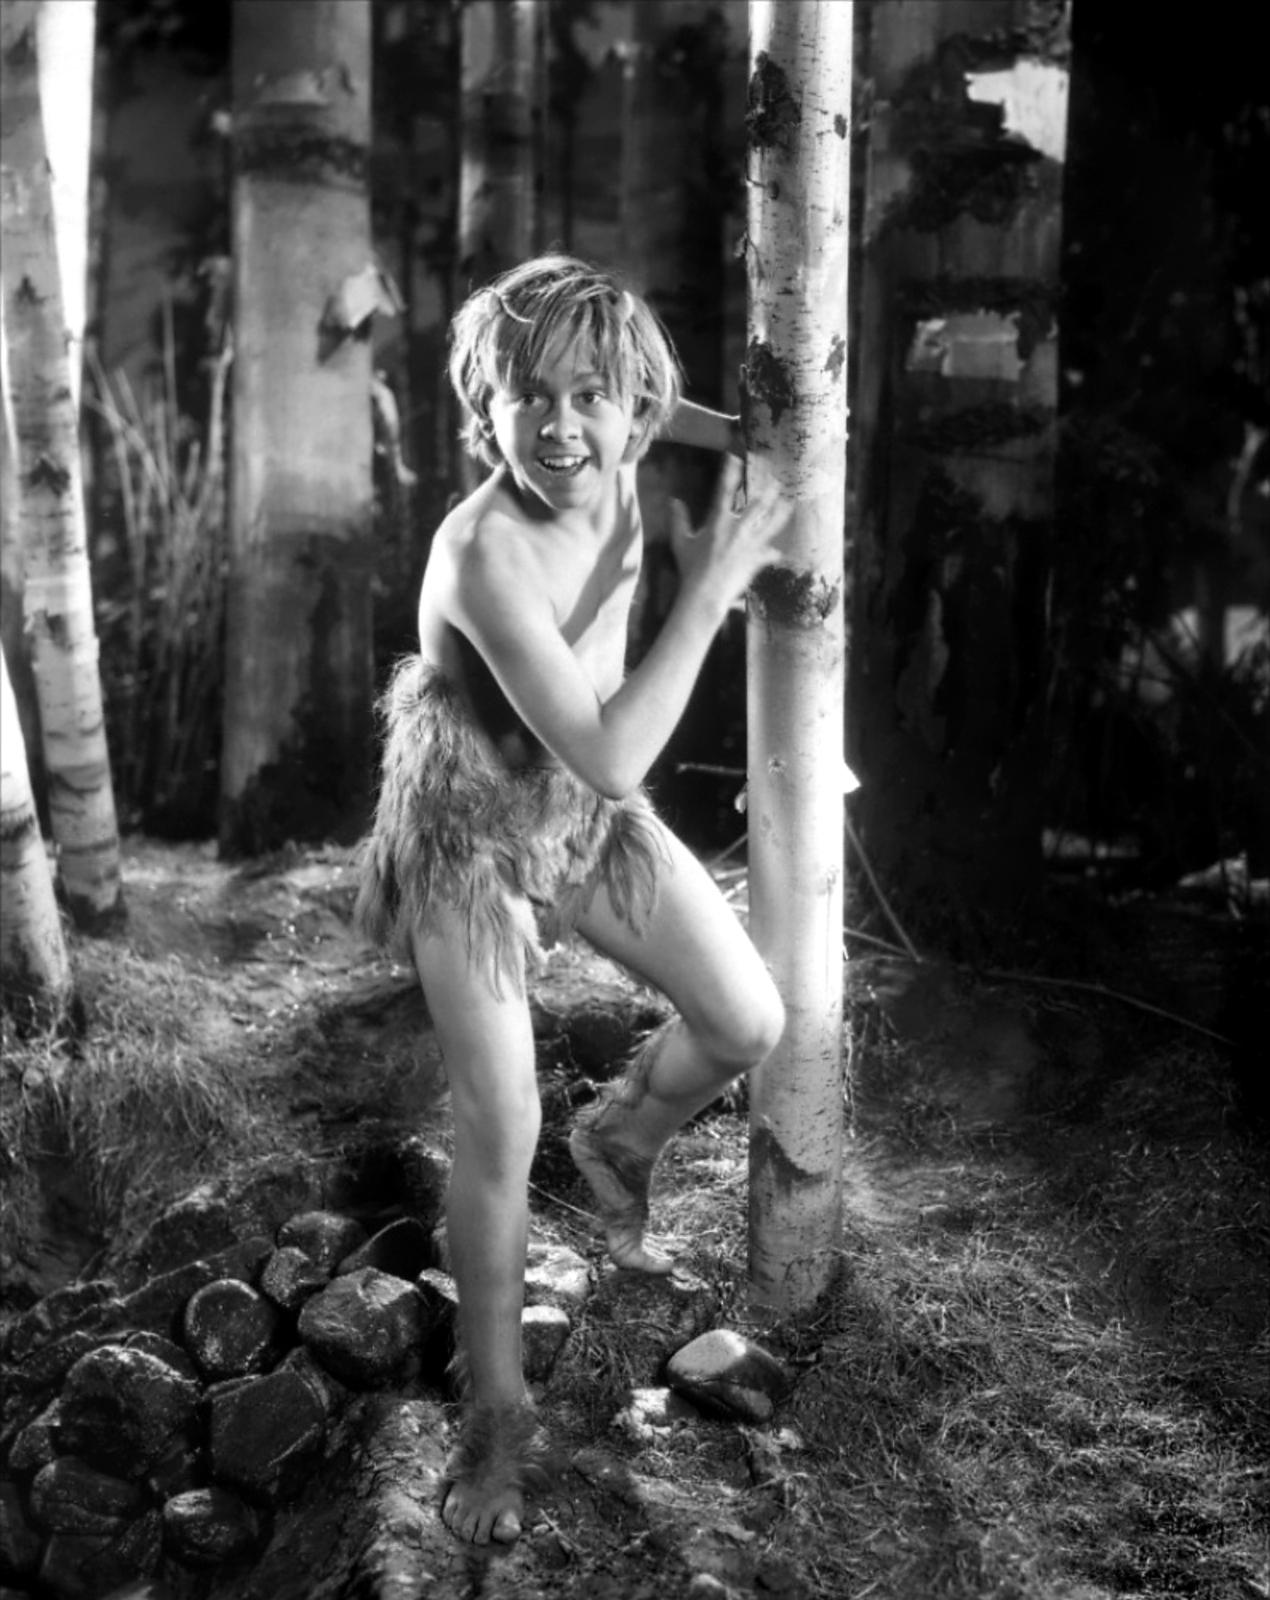 Annex - Rooney, Mickey (A Midsummer Night's Dream)_01